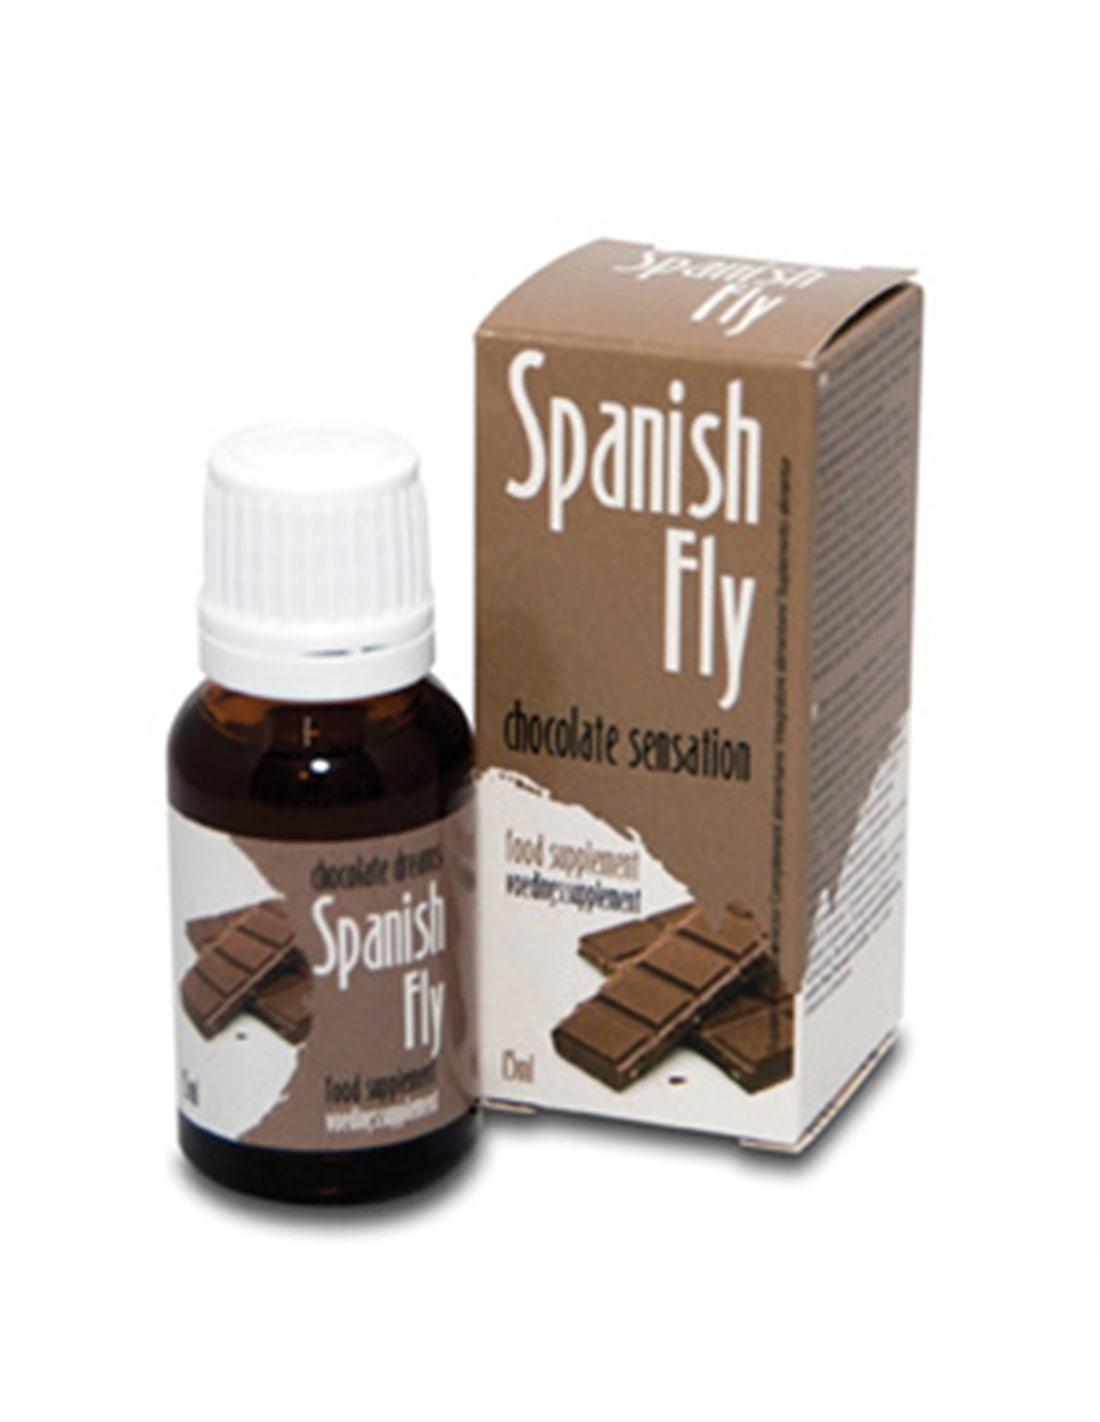 Gotas Spanish Fly Chocolate - 15ml - PR2010319700